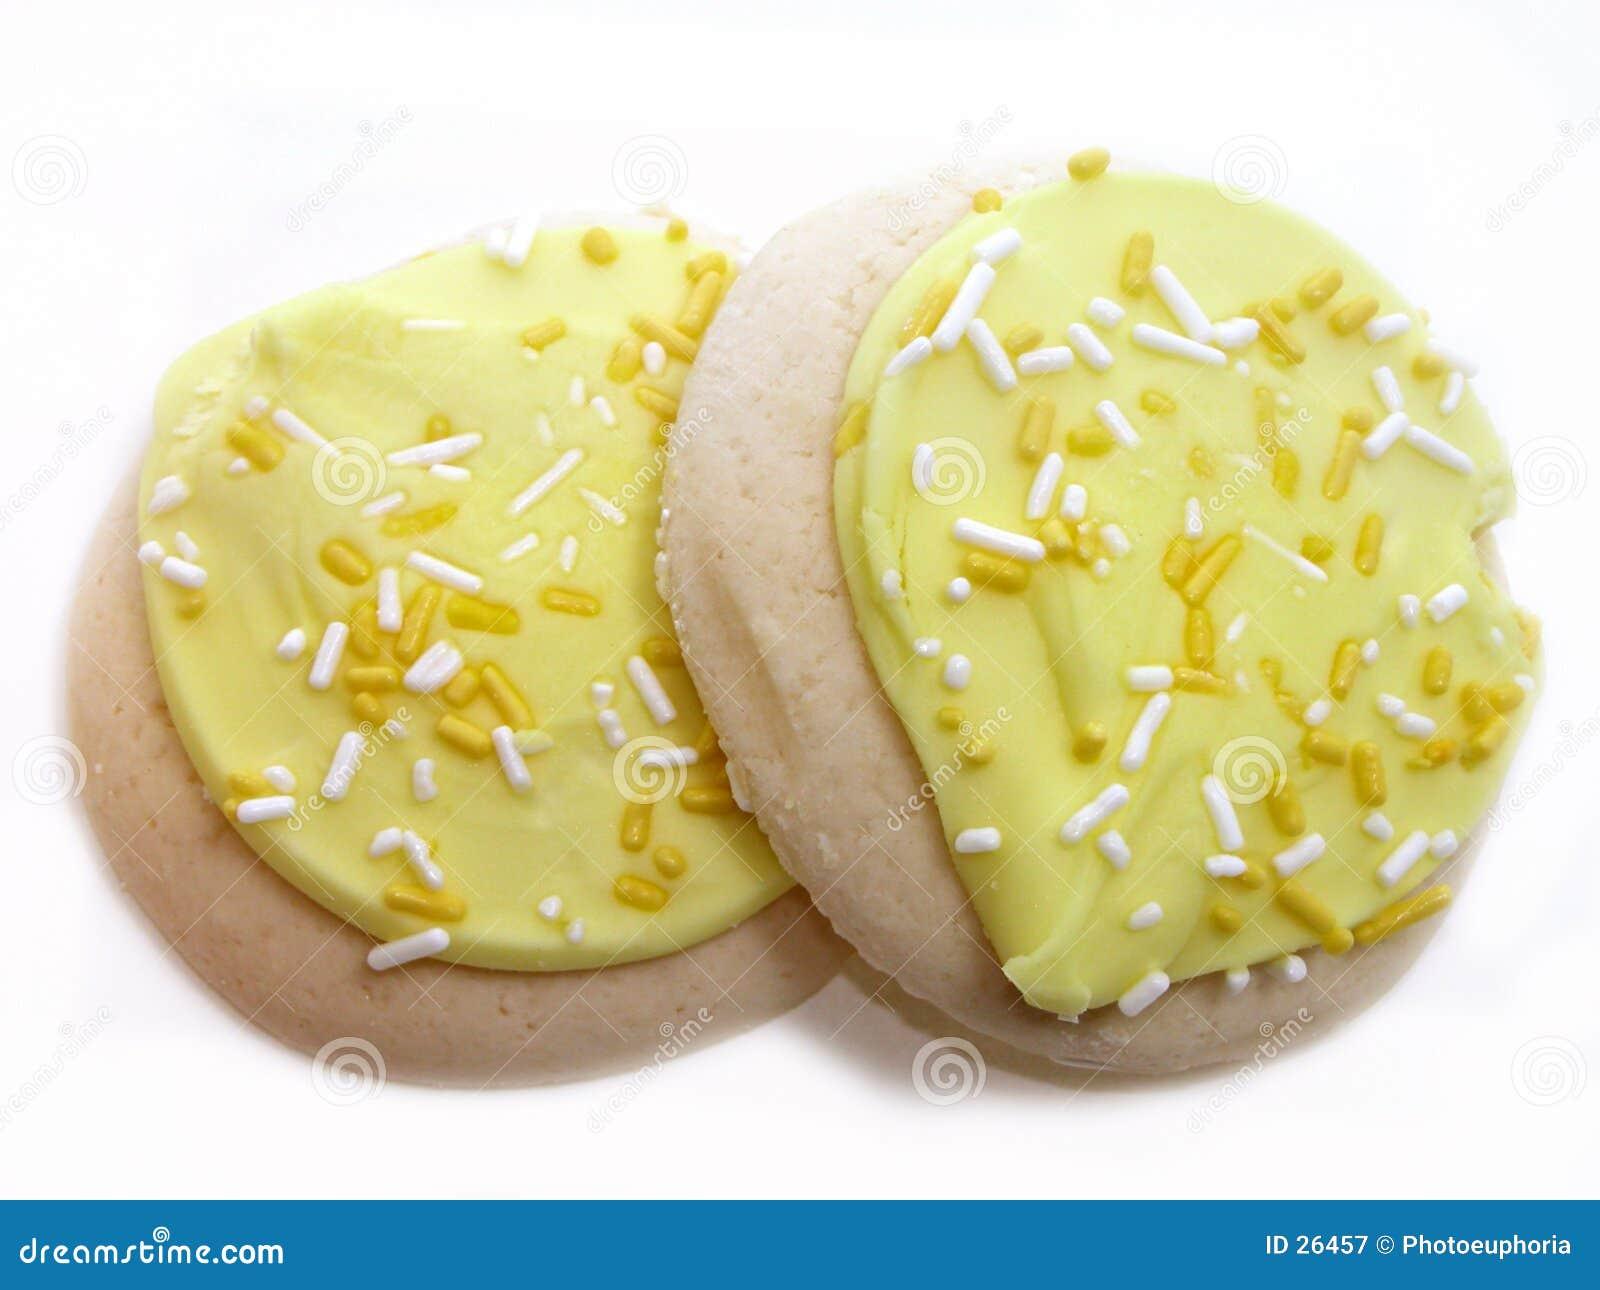 Lemon Frosted Sugar Cookies